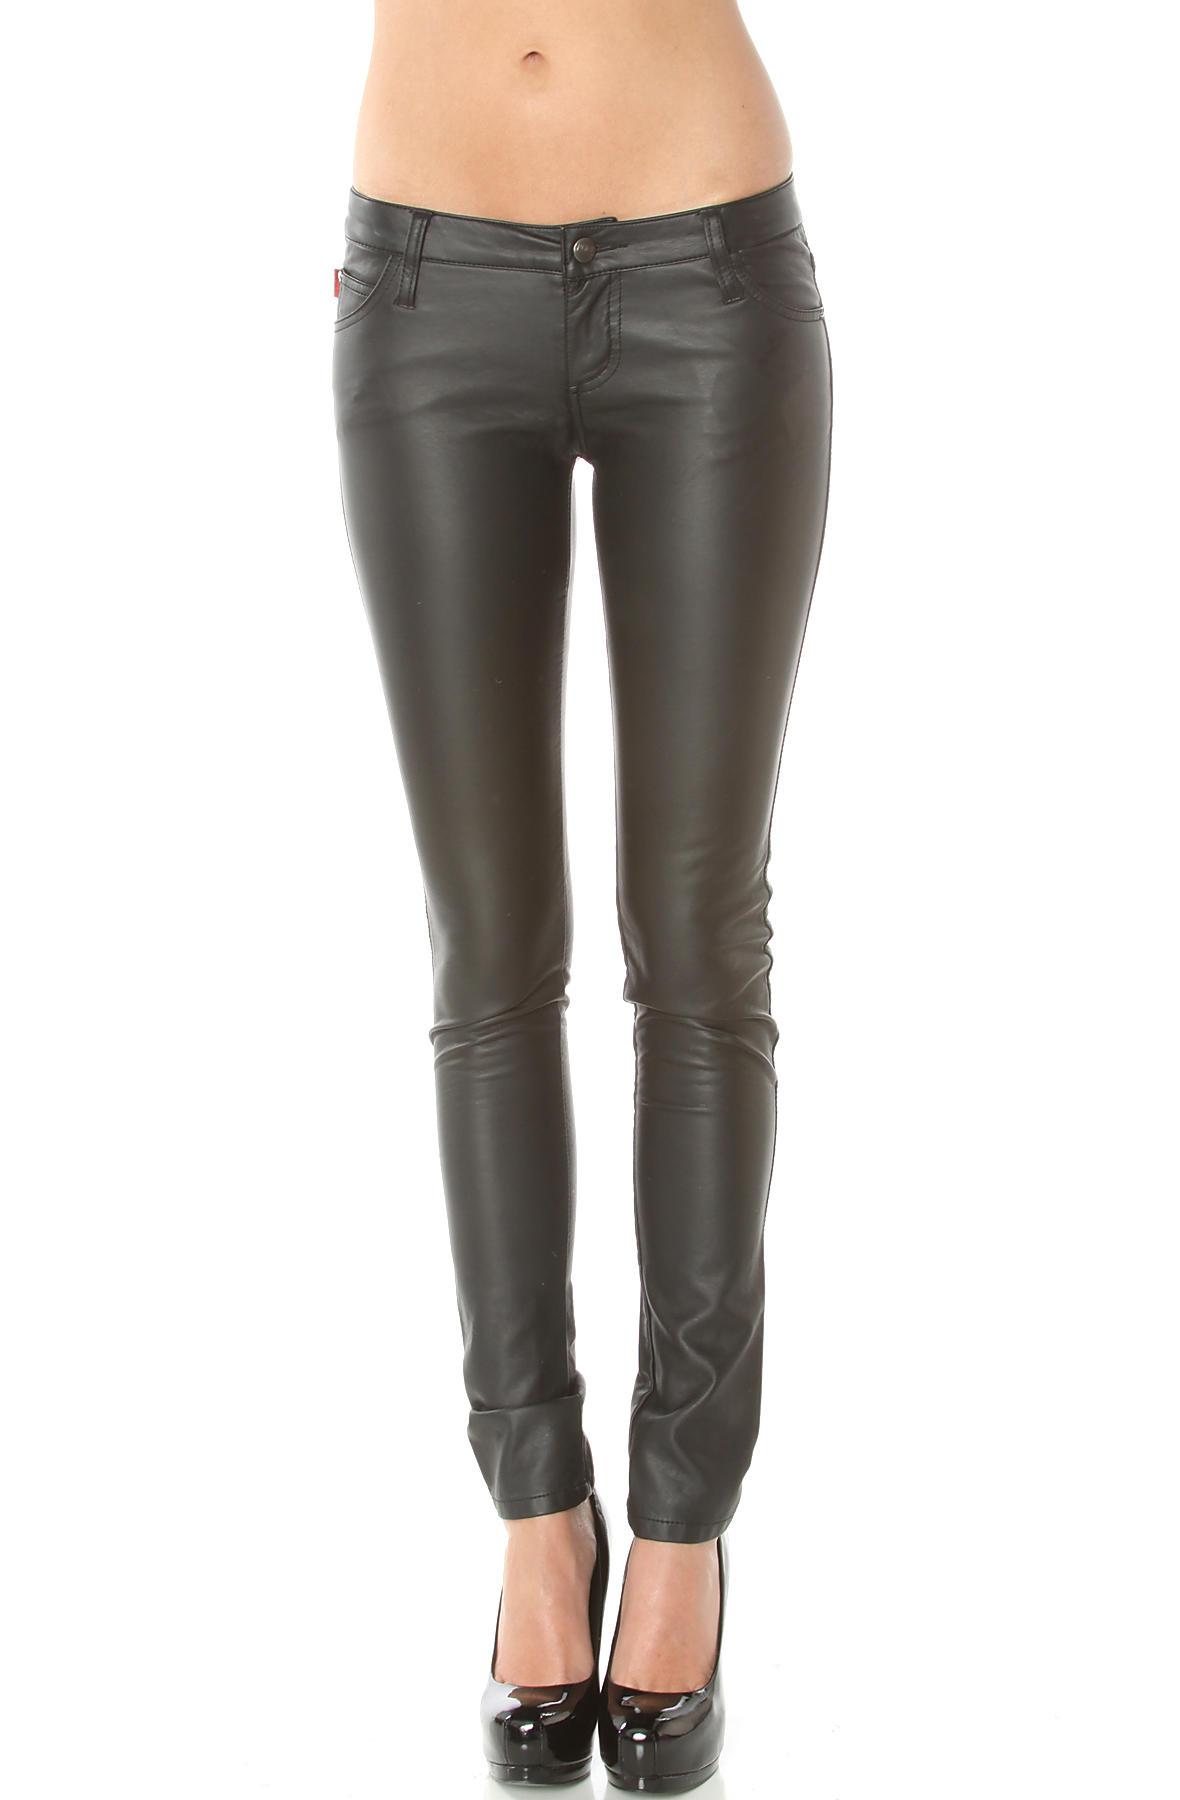 Tripp nyc pants deville pleather in black